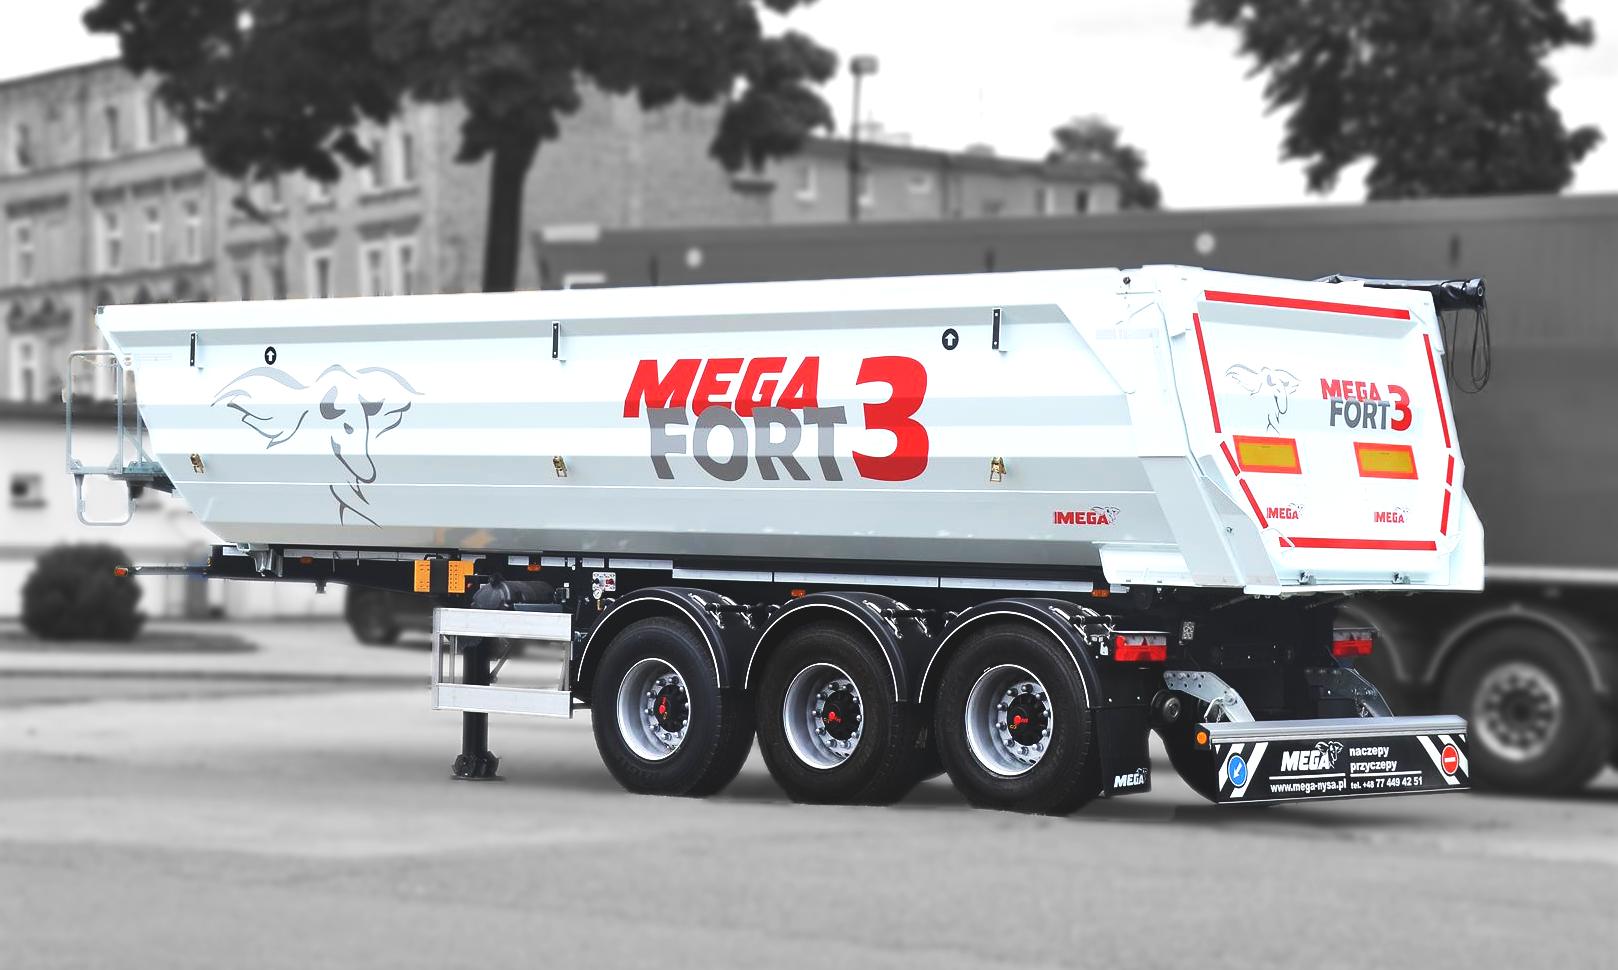 MEGA FORT 3 - SBRKZ